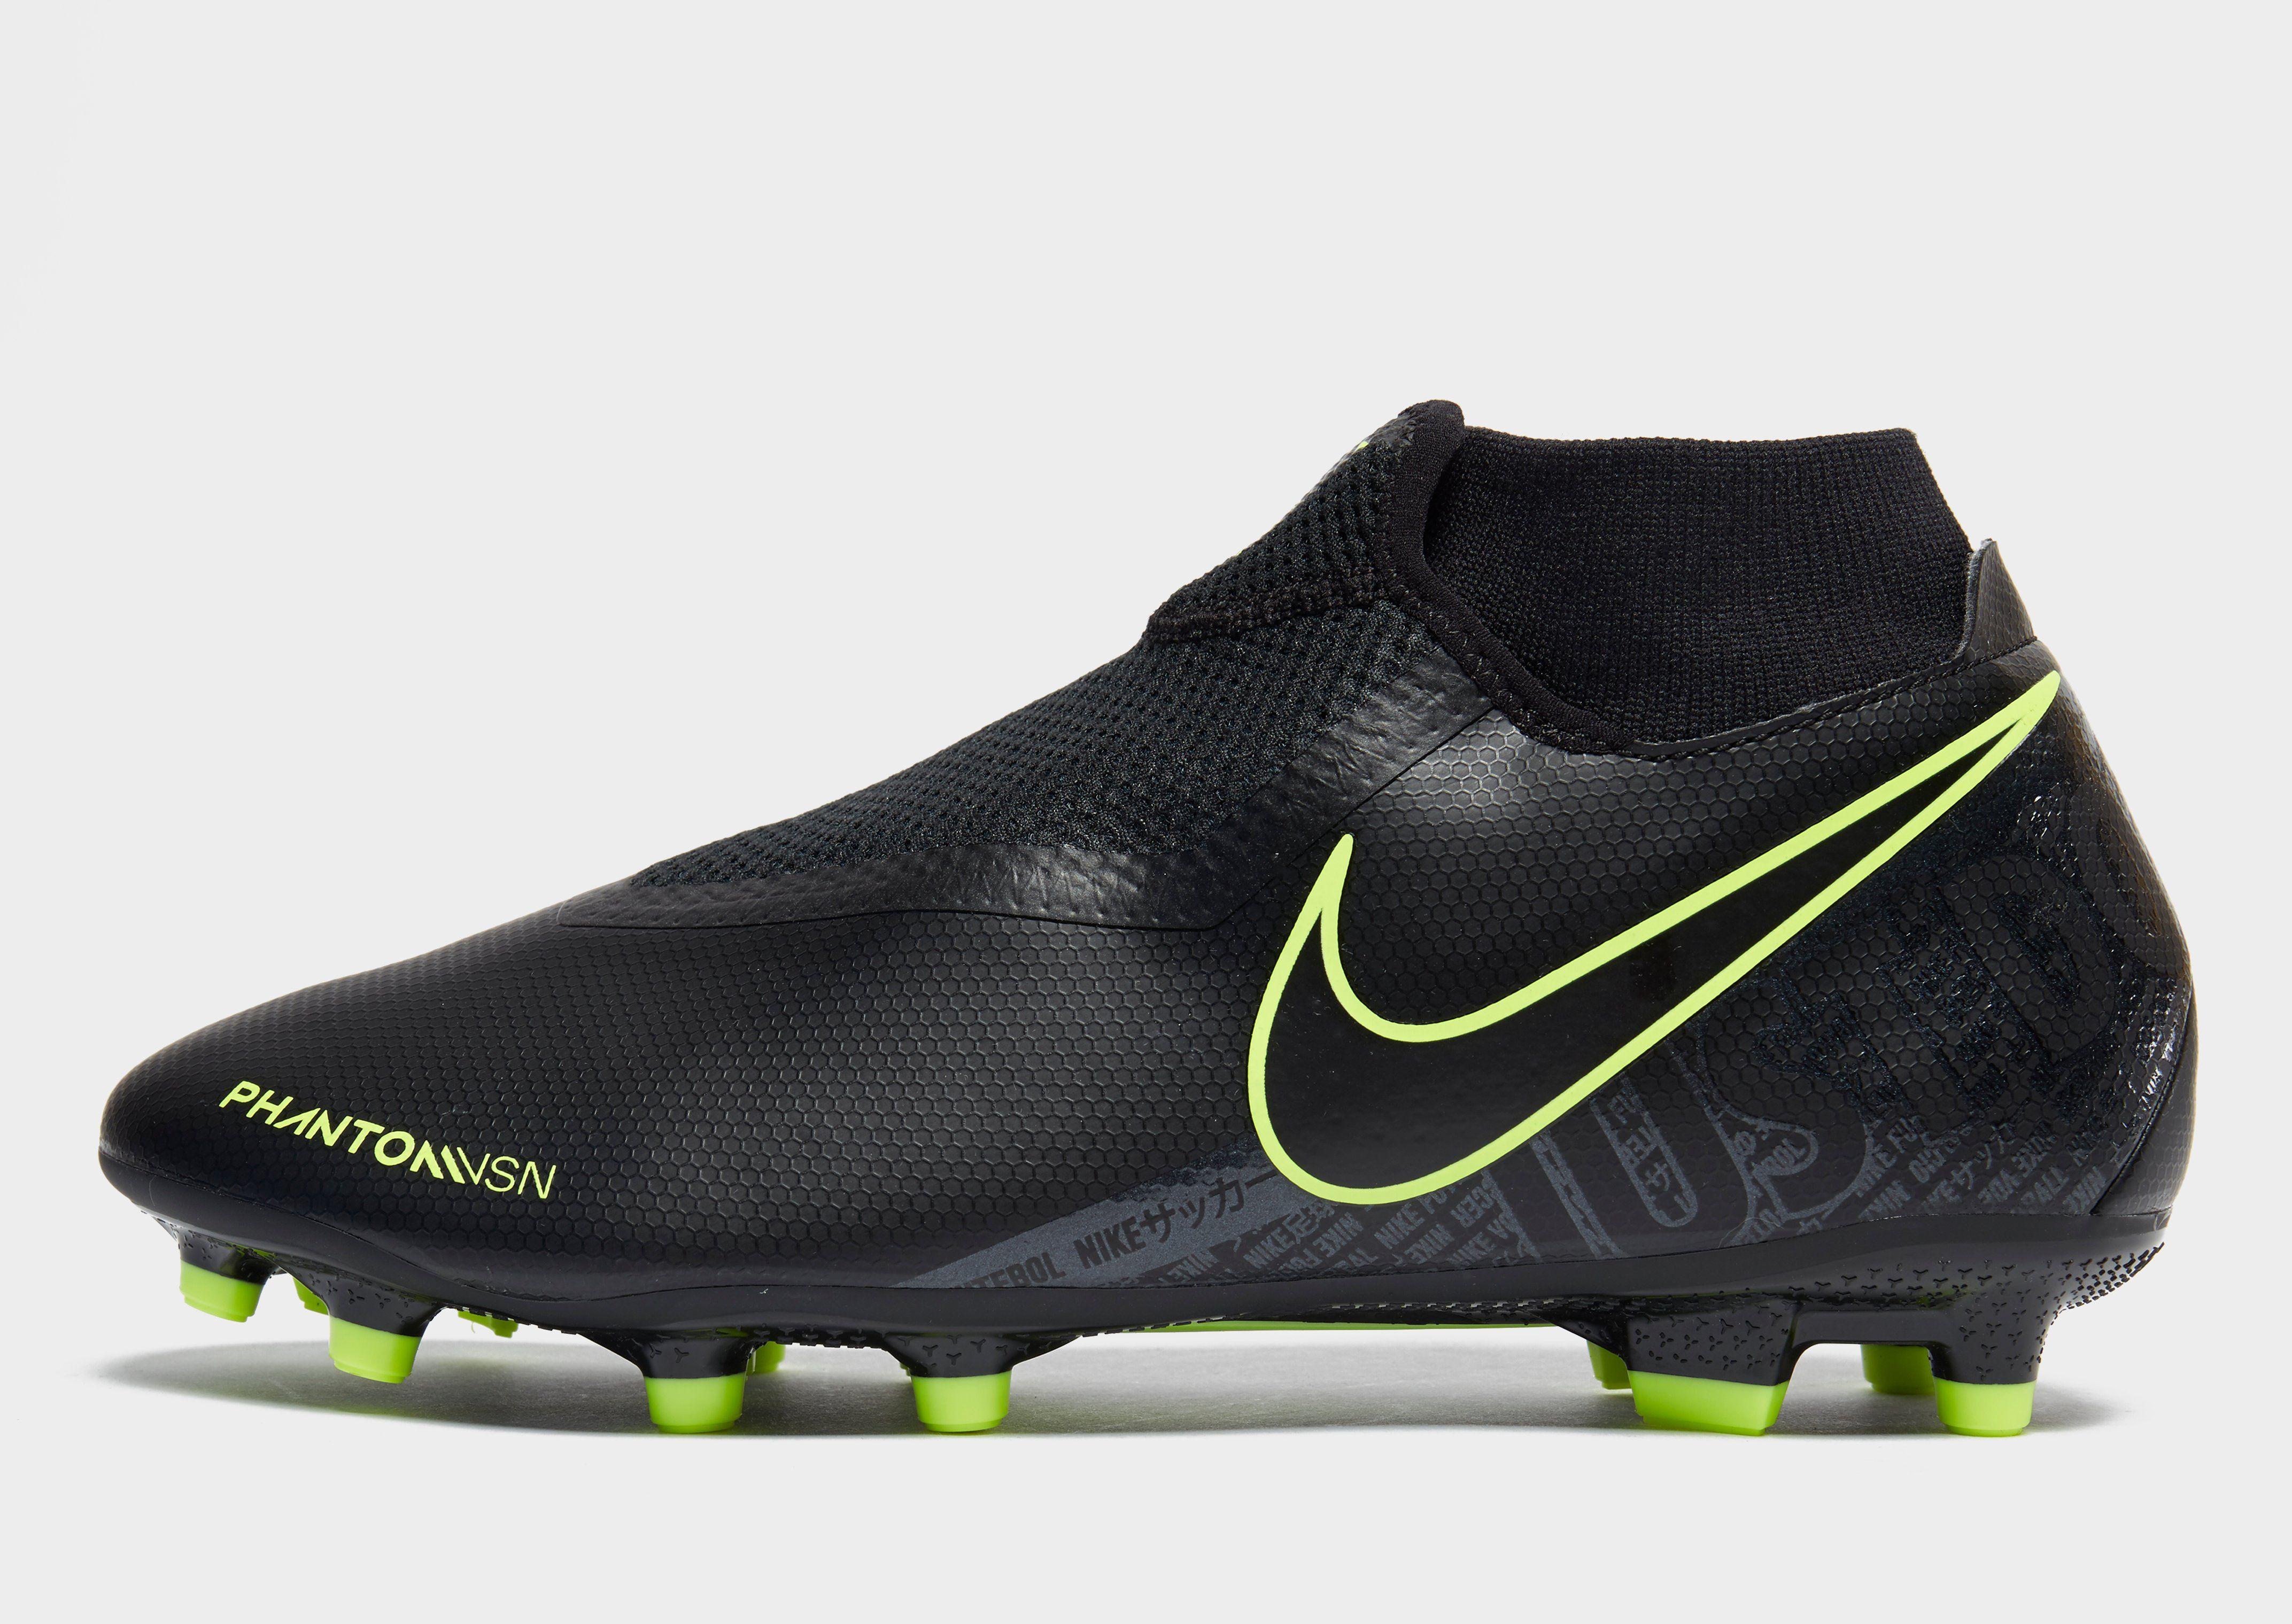 finest selection 27c2e 9f6e3 Nike Nike Phantom Vision Academy Dynamic Fit MG Multi-Ground Football Boot  | JD Sports